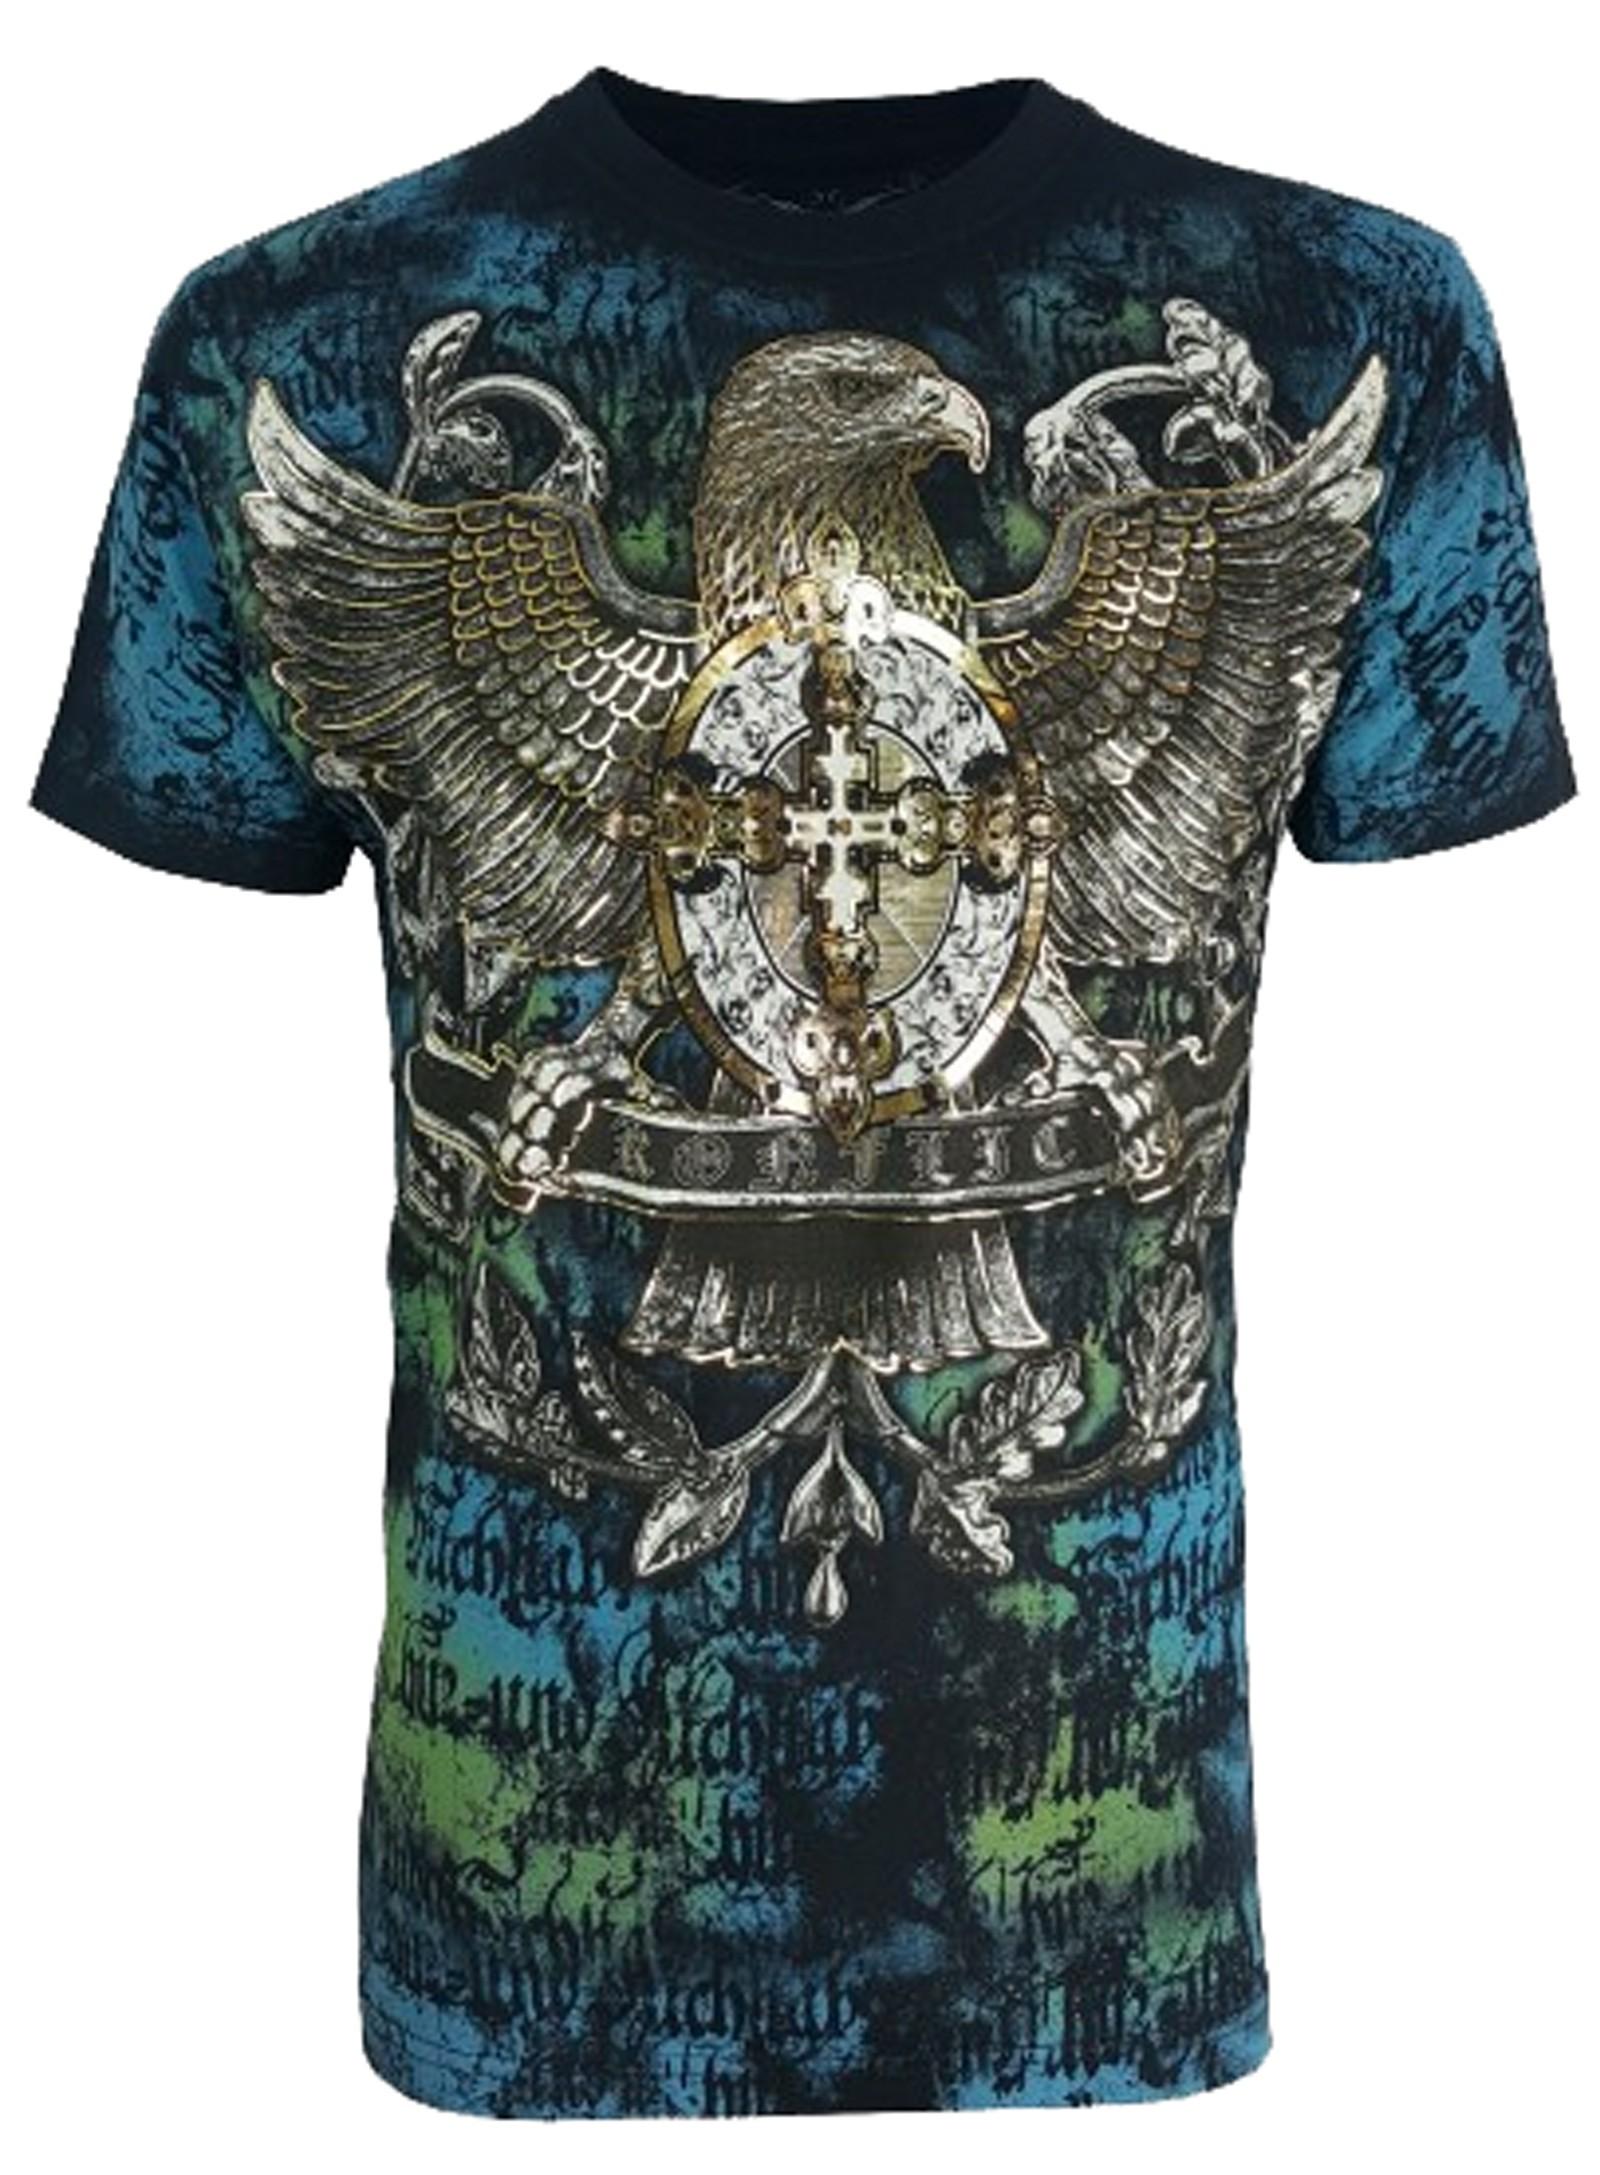 Konflic Clothing - Eagle Crest T-Shirt